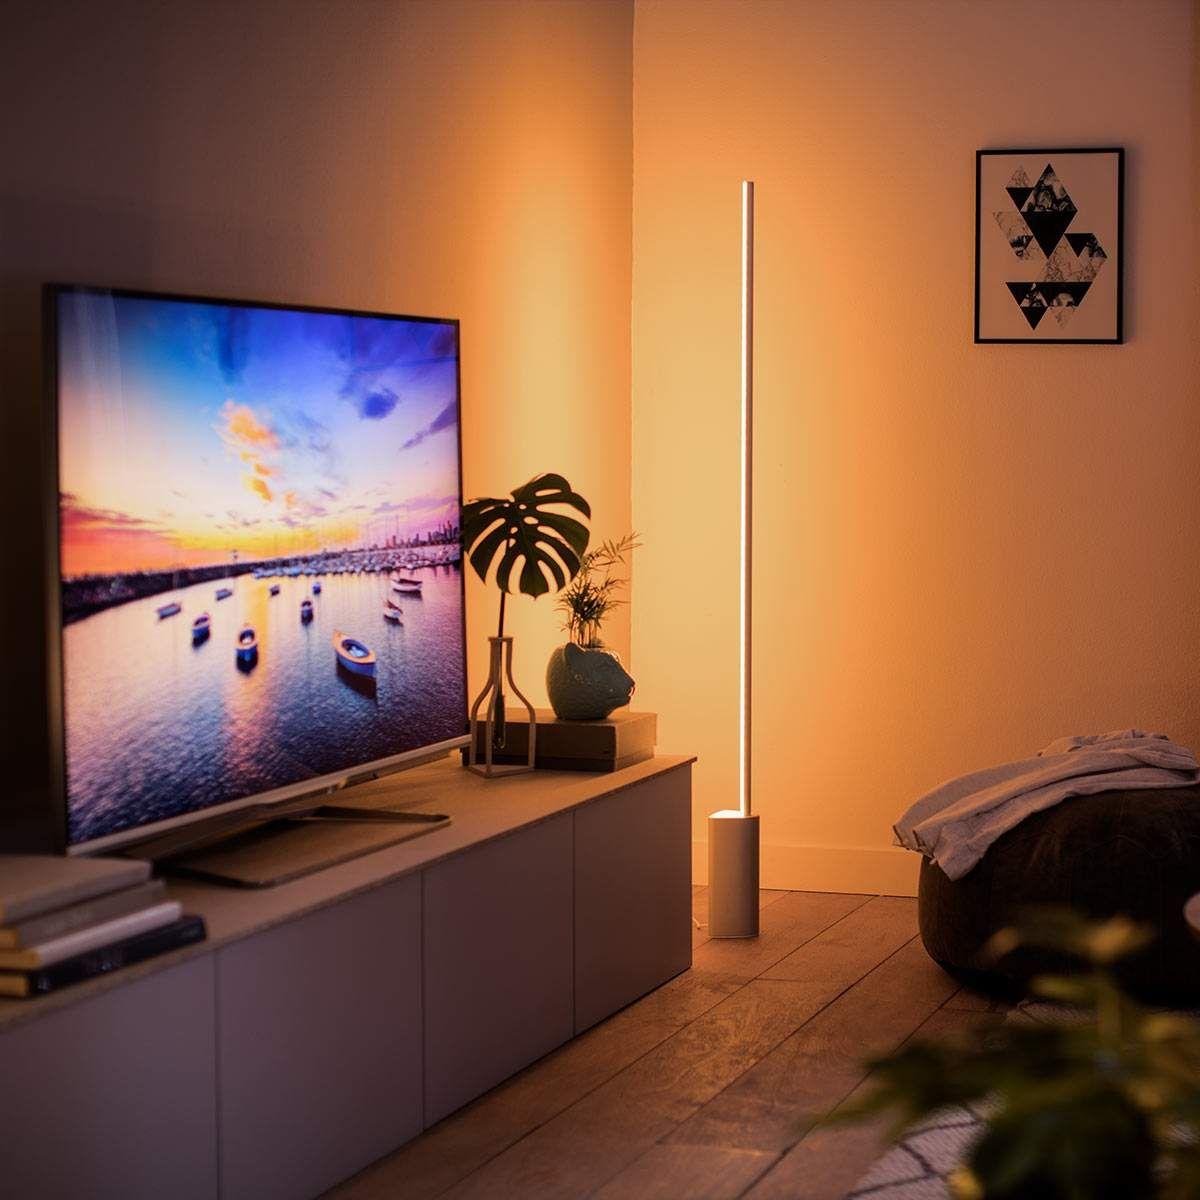 Philips Hue Signe Led Stehleuchte Beleuchtungskonzepte Led Stehleuchte Beleuchtung